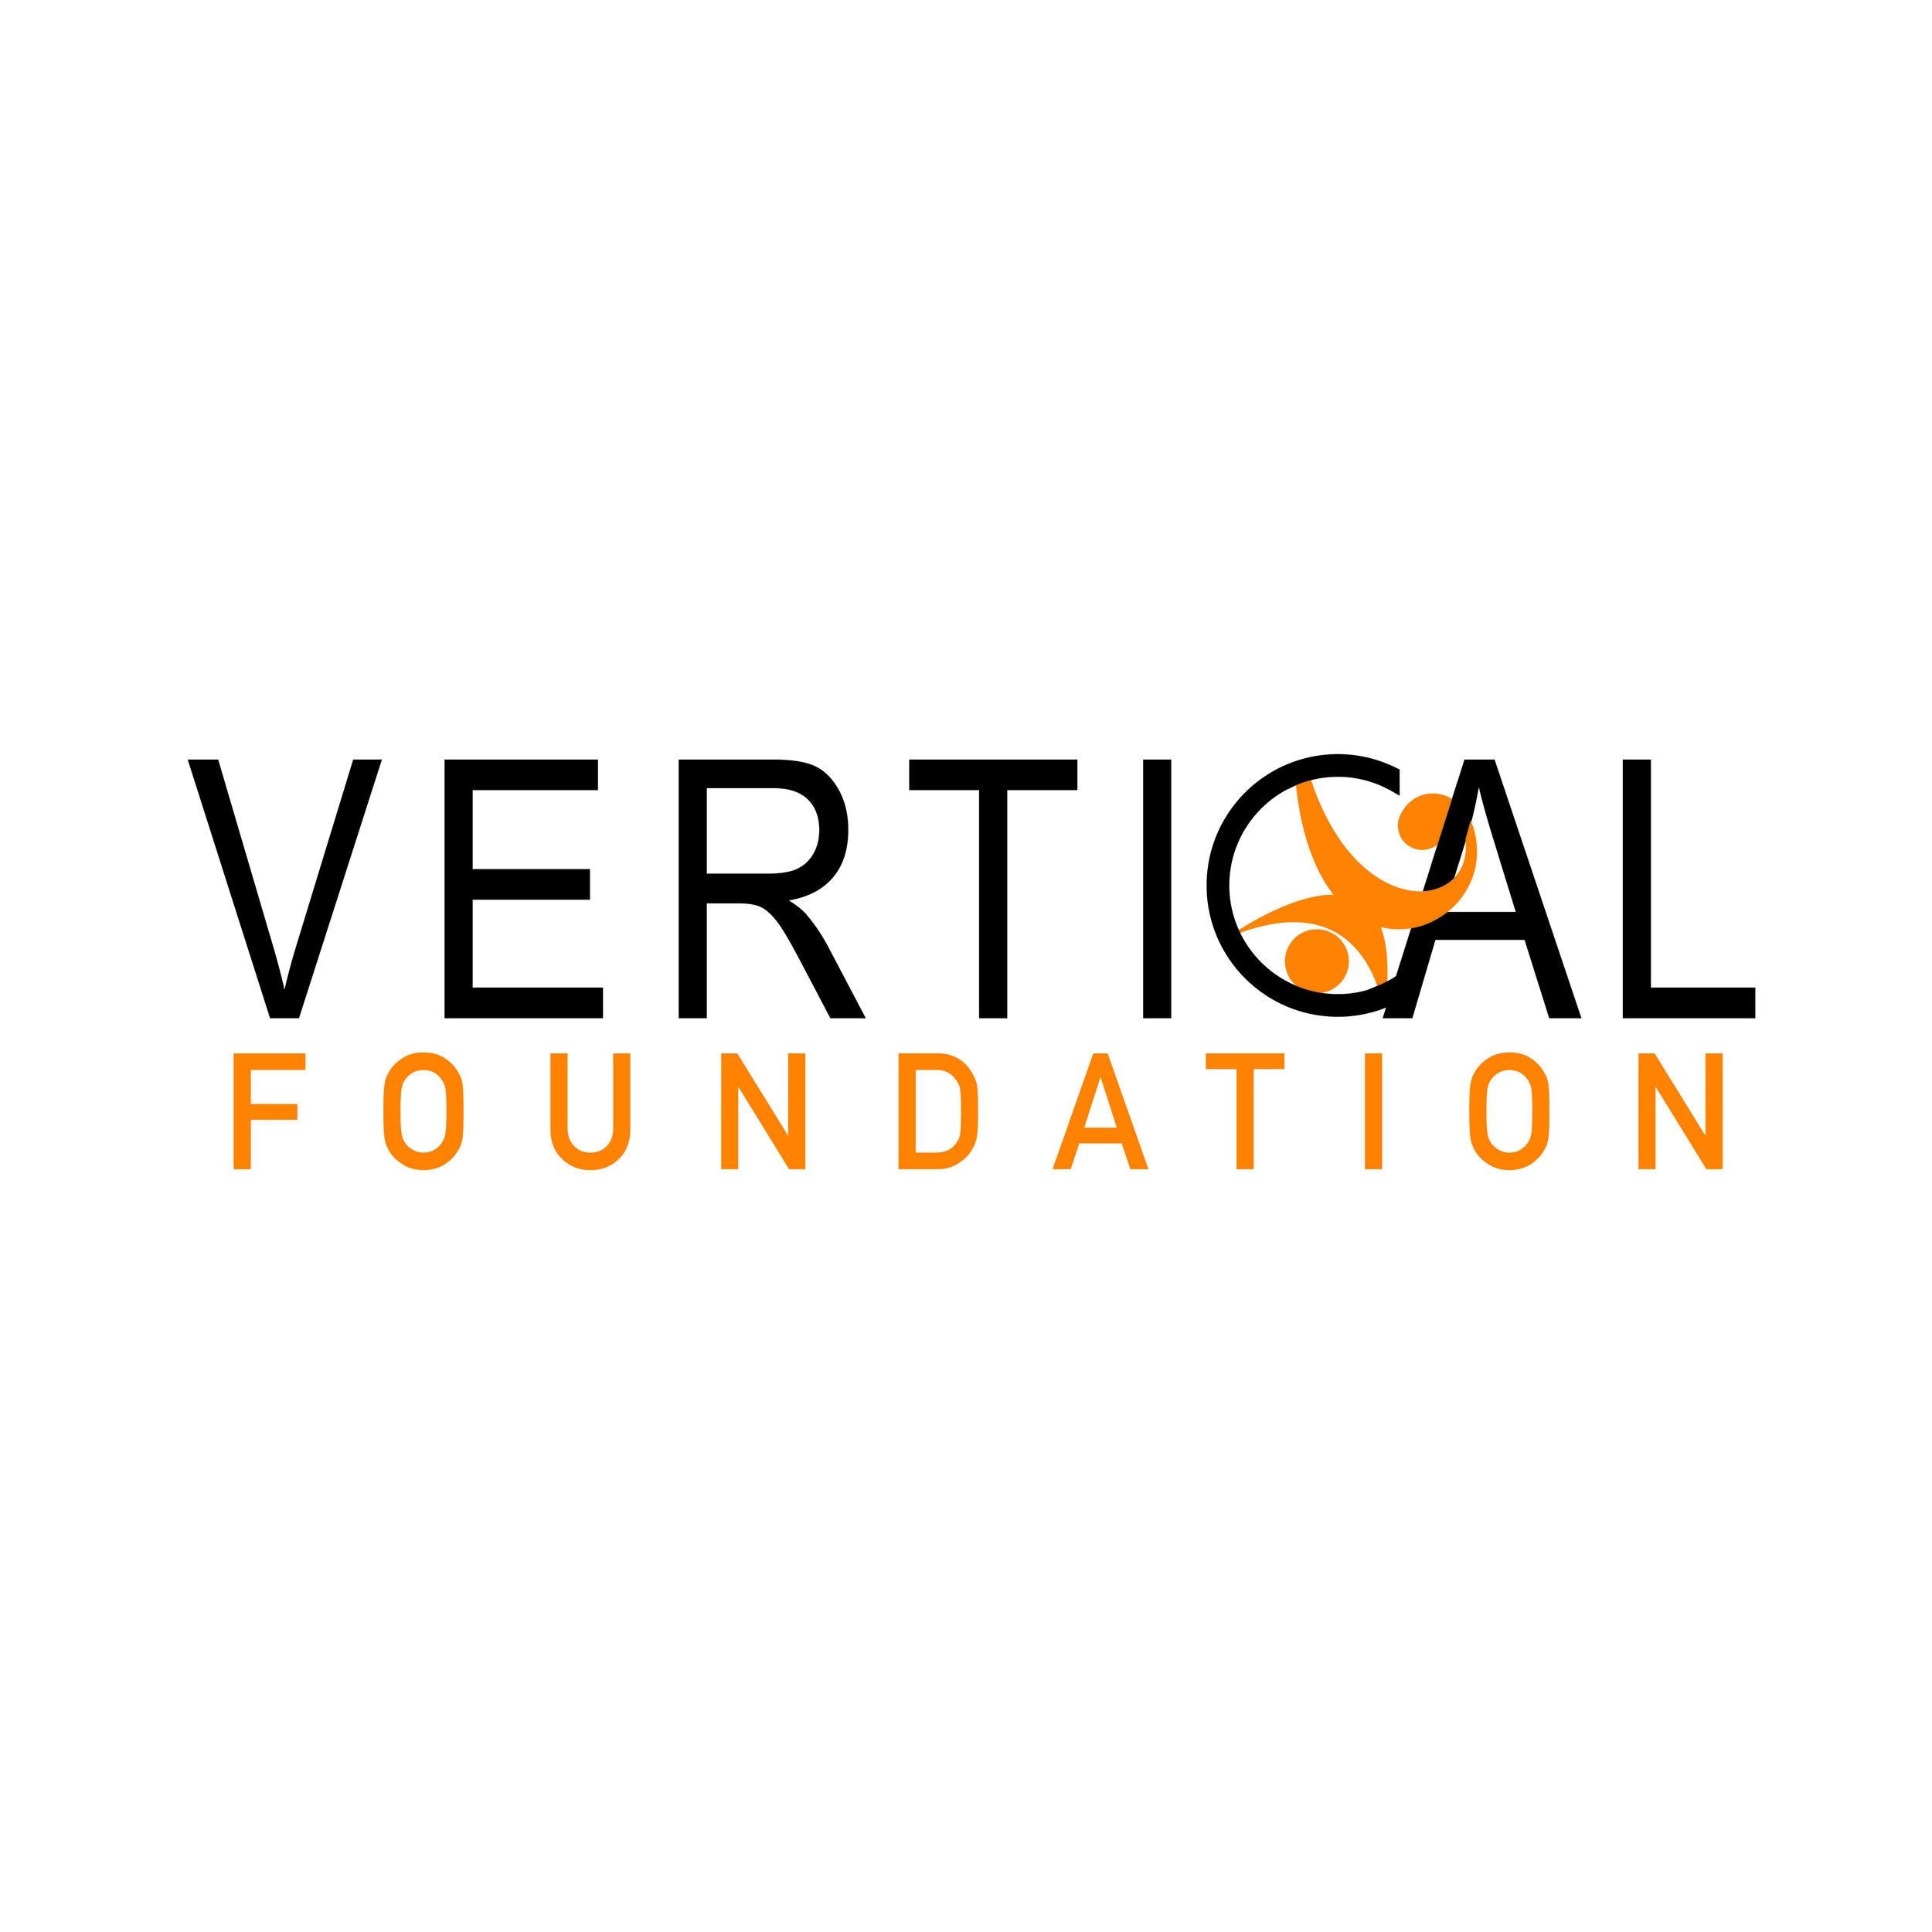 vertical-foundation-hr.jpg